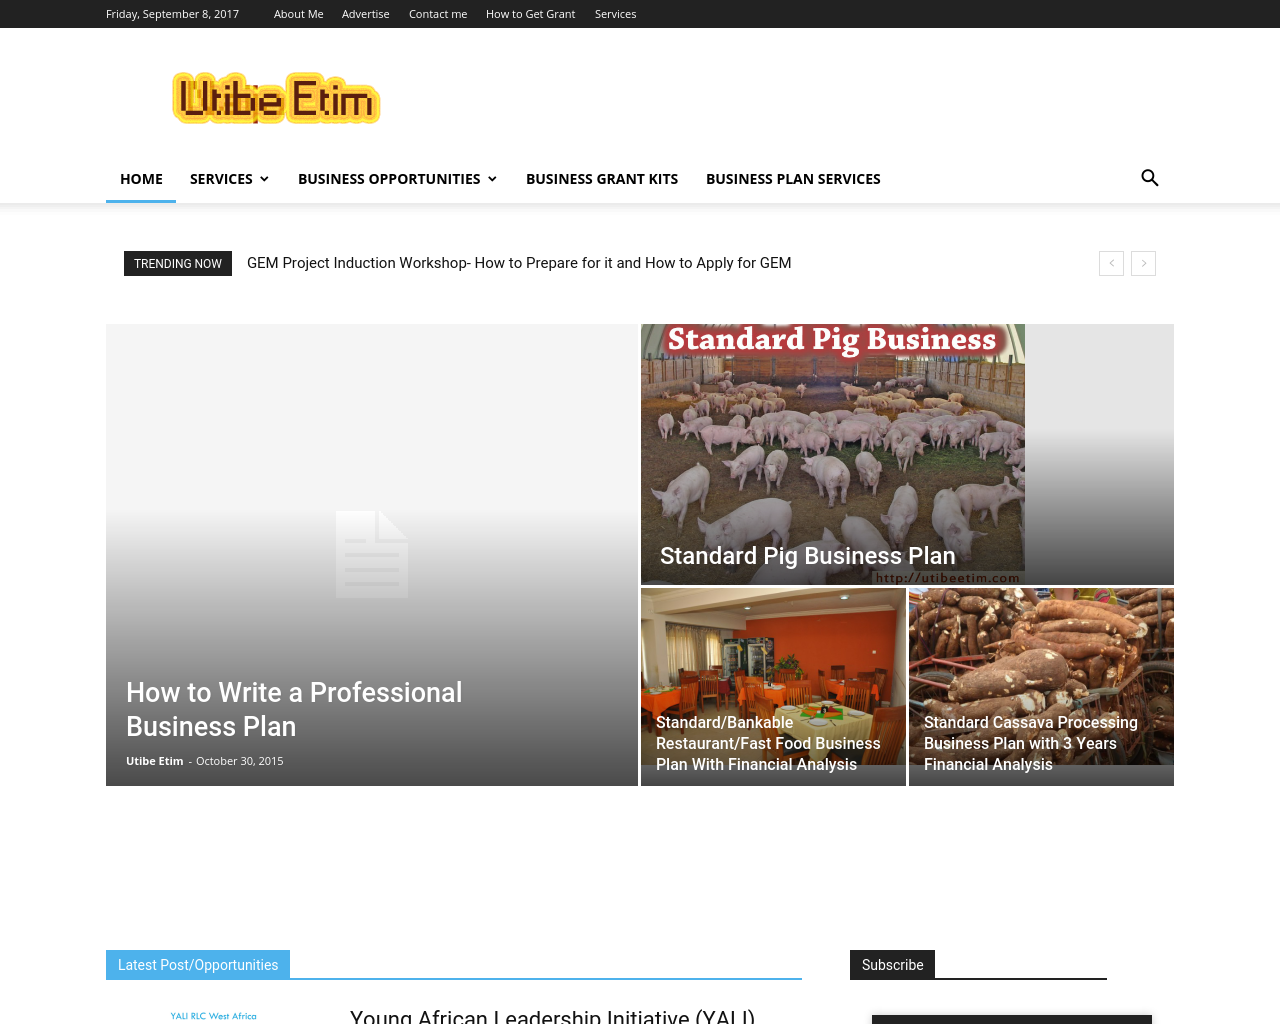 Utibe-Etim-Advertising-Reviews-Pricing